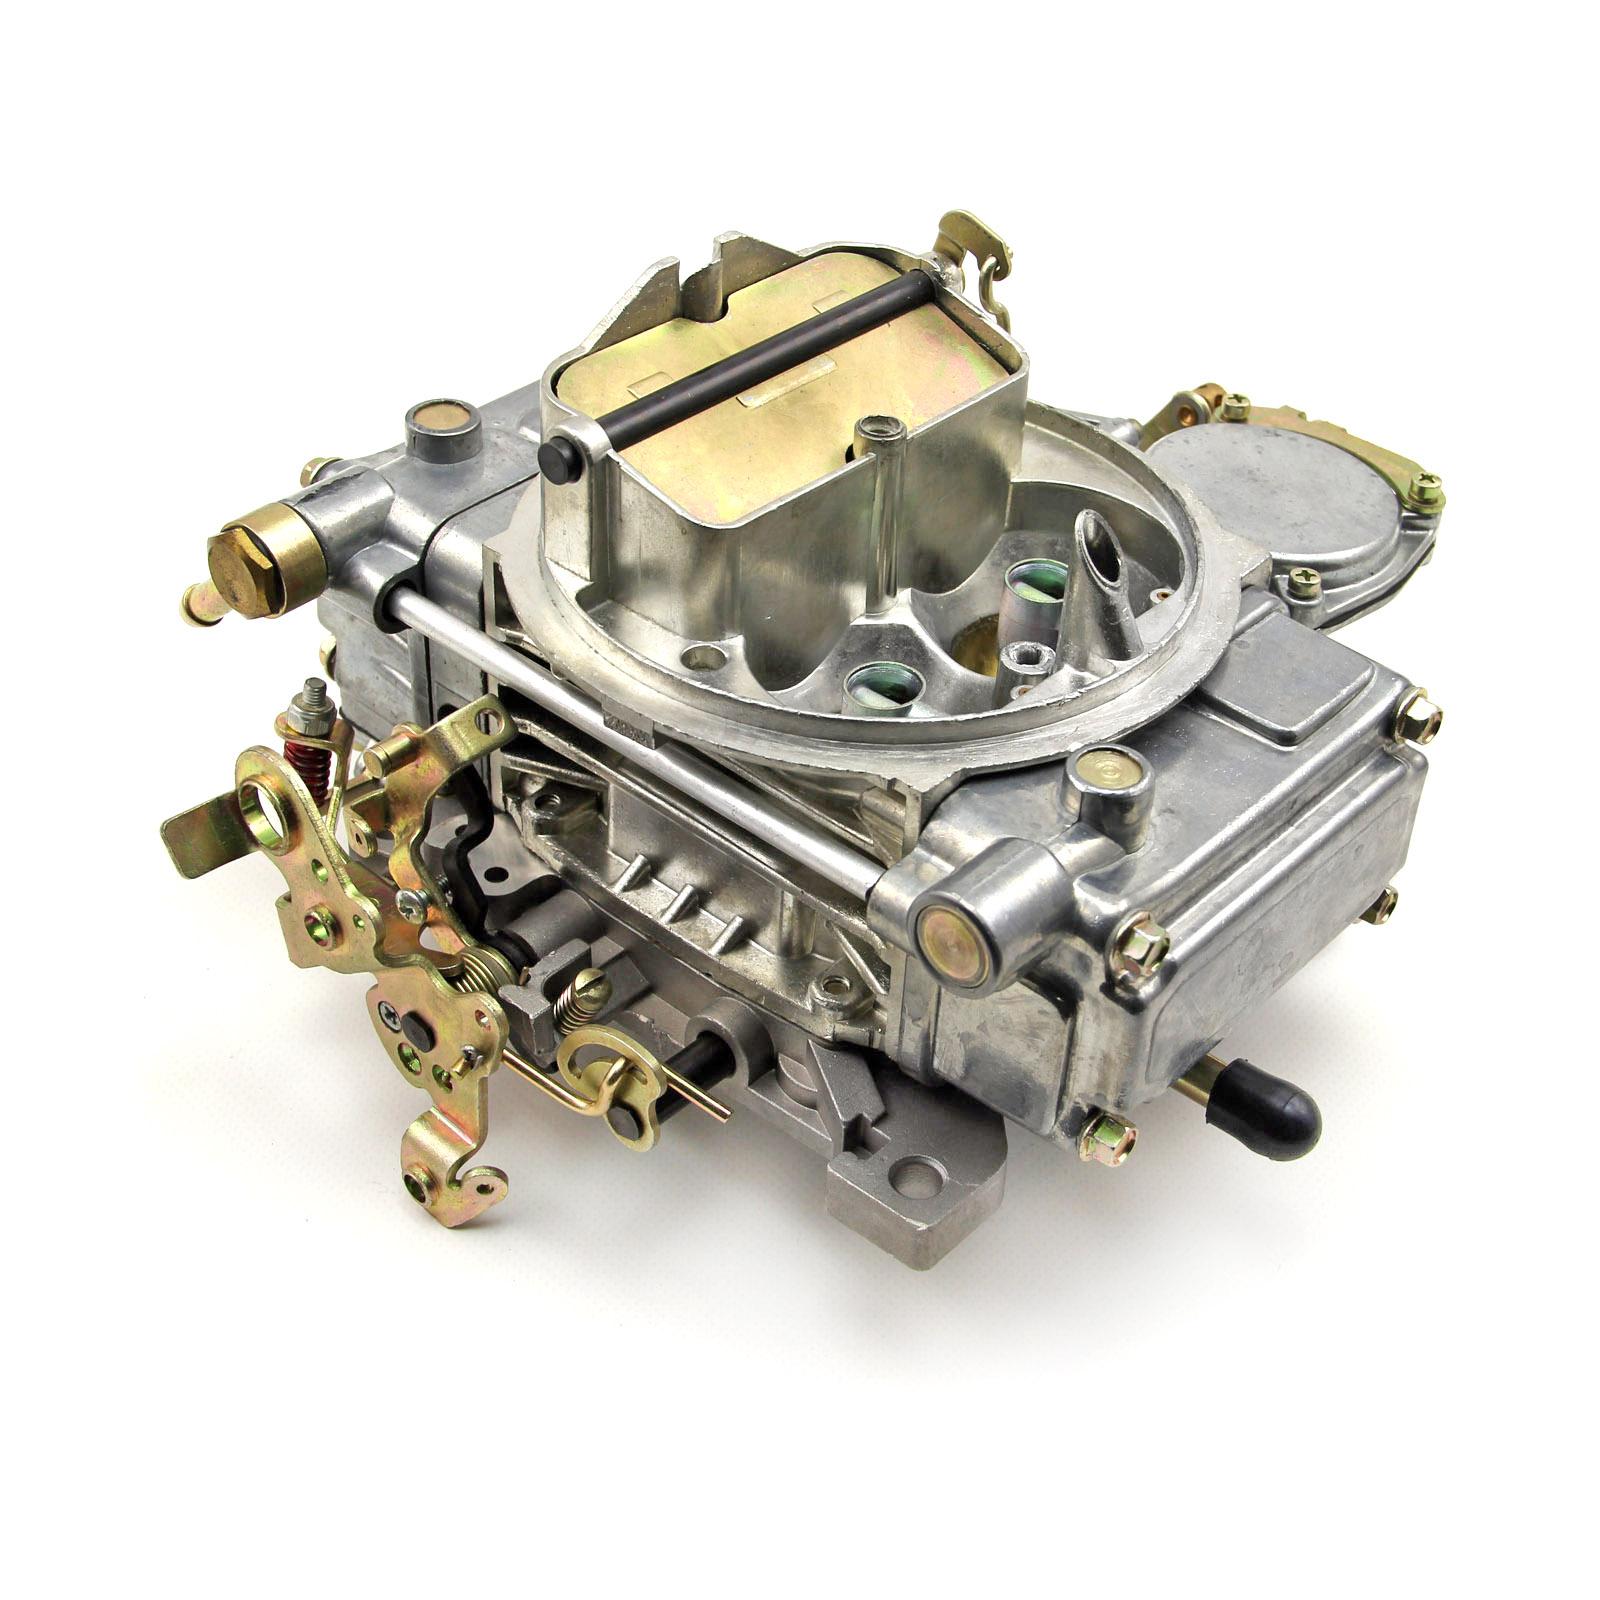 610 CFM Natural Finish 4-Bbl Vacuum Secondary Carburetor Built in USA